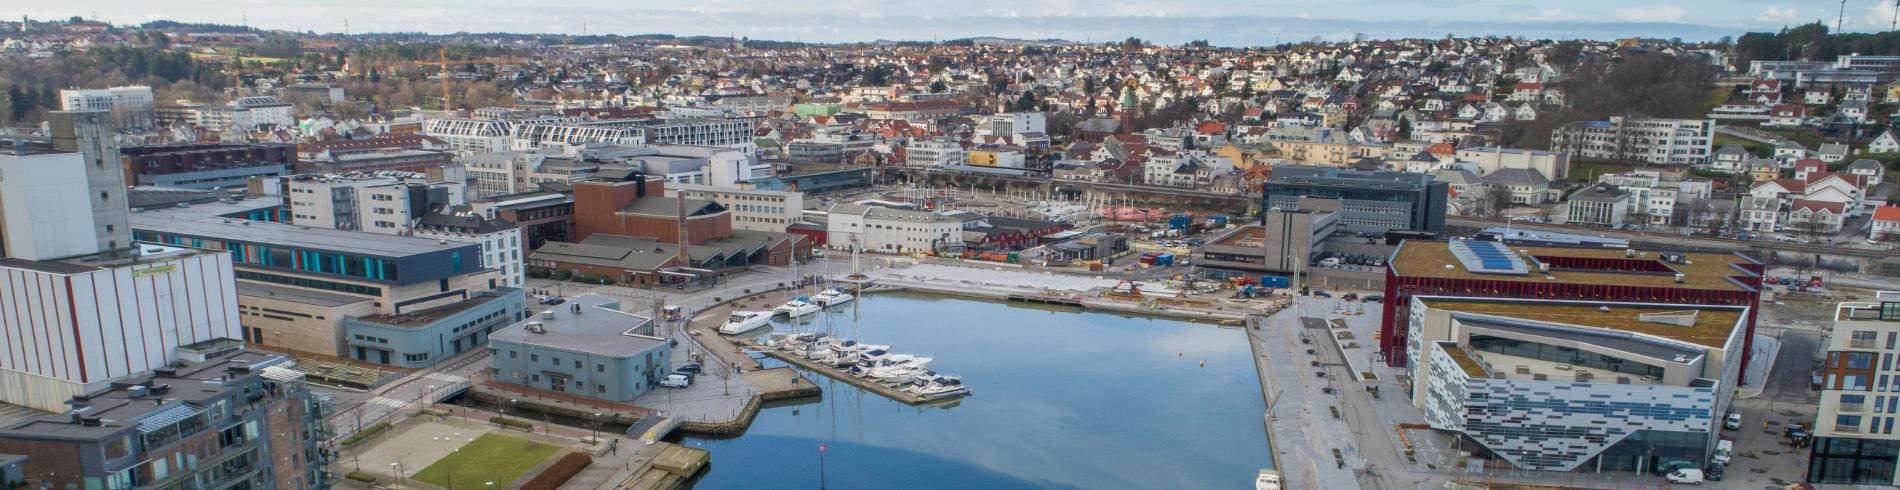 Sandnes kommune cover image